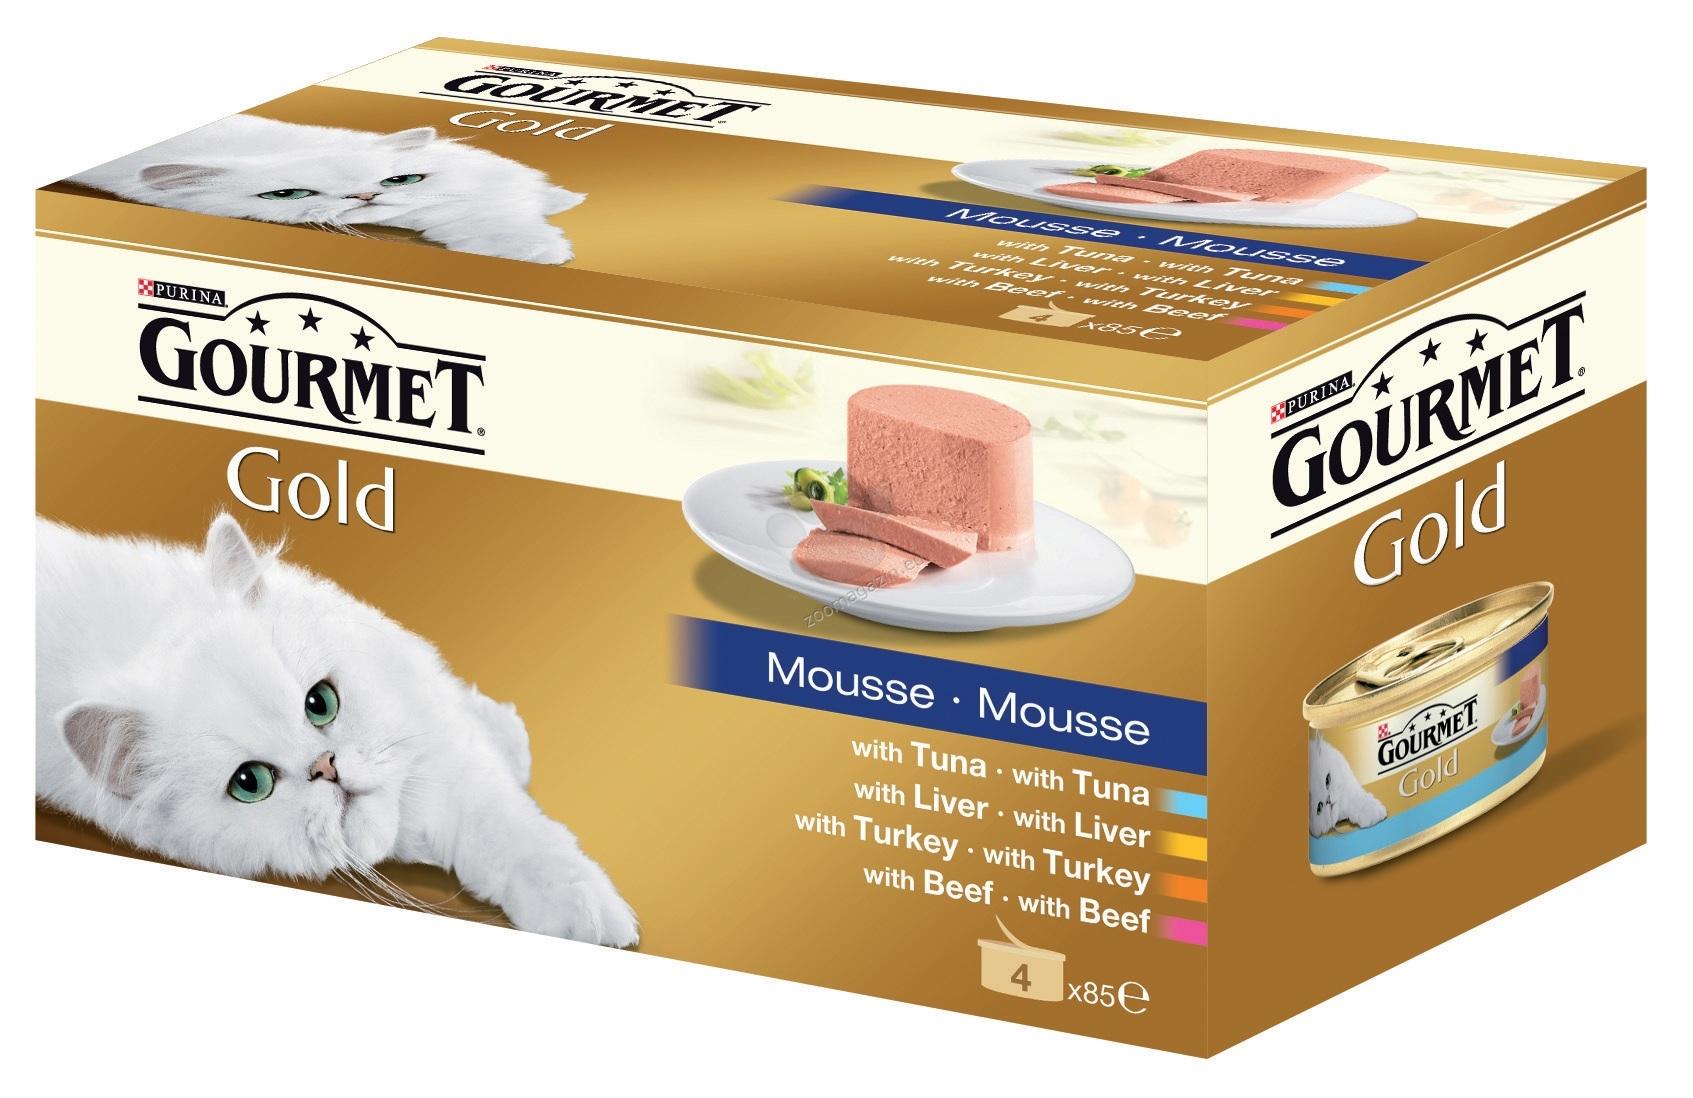 Gourmet Gold Mousse - мултиопаковка пастети - 4 бр x 85 гр